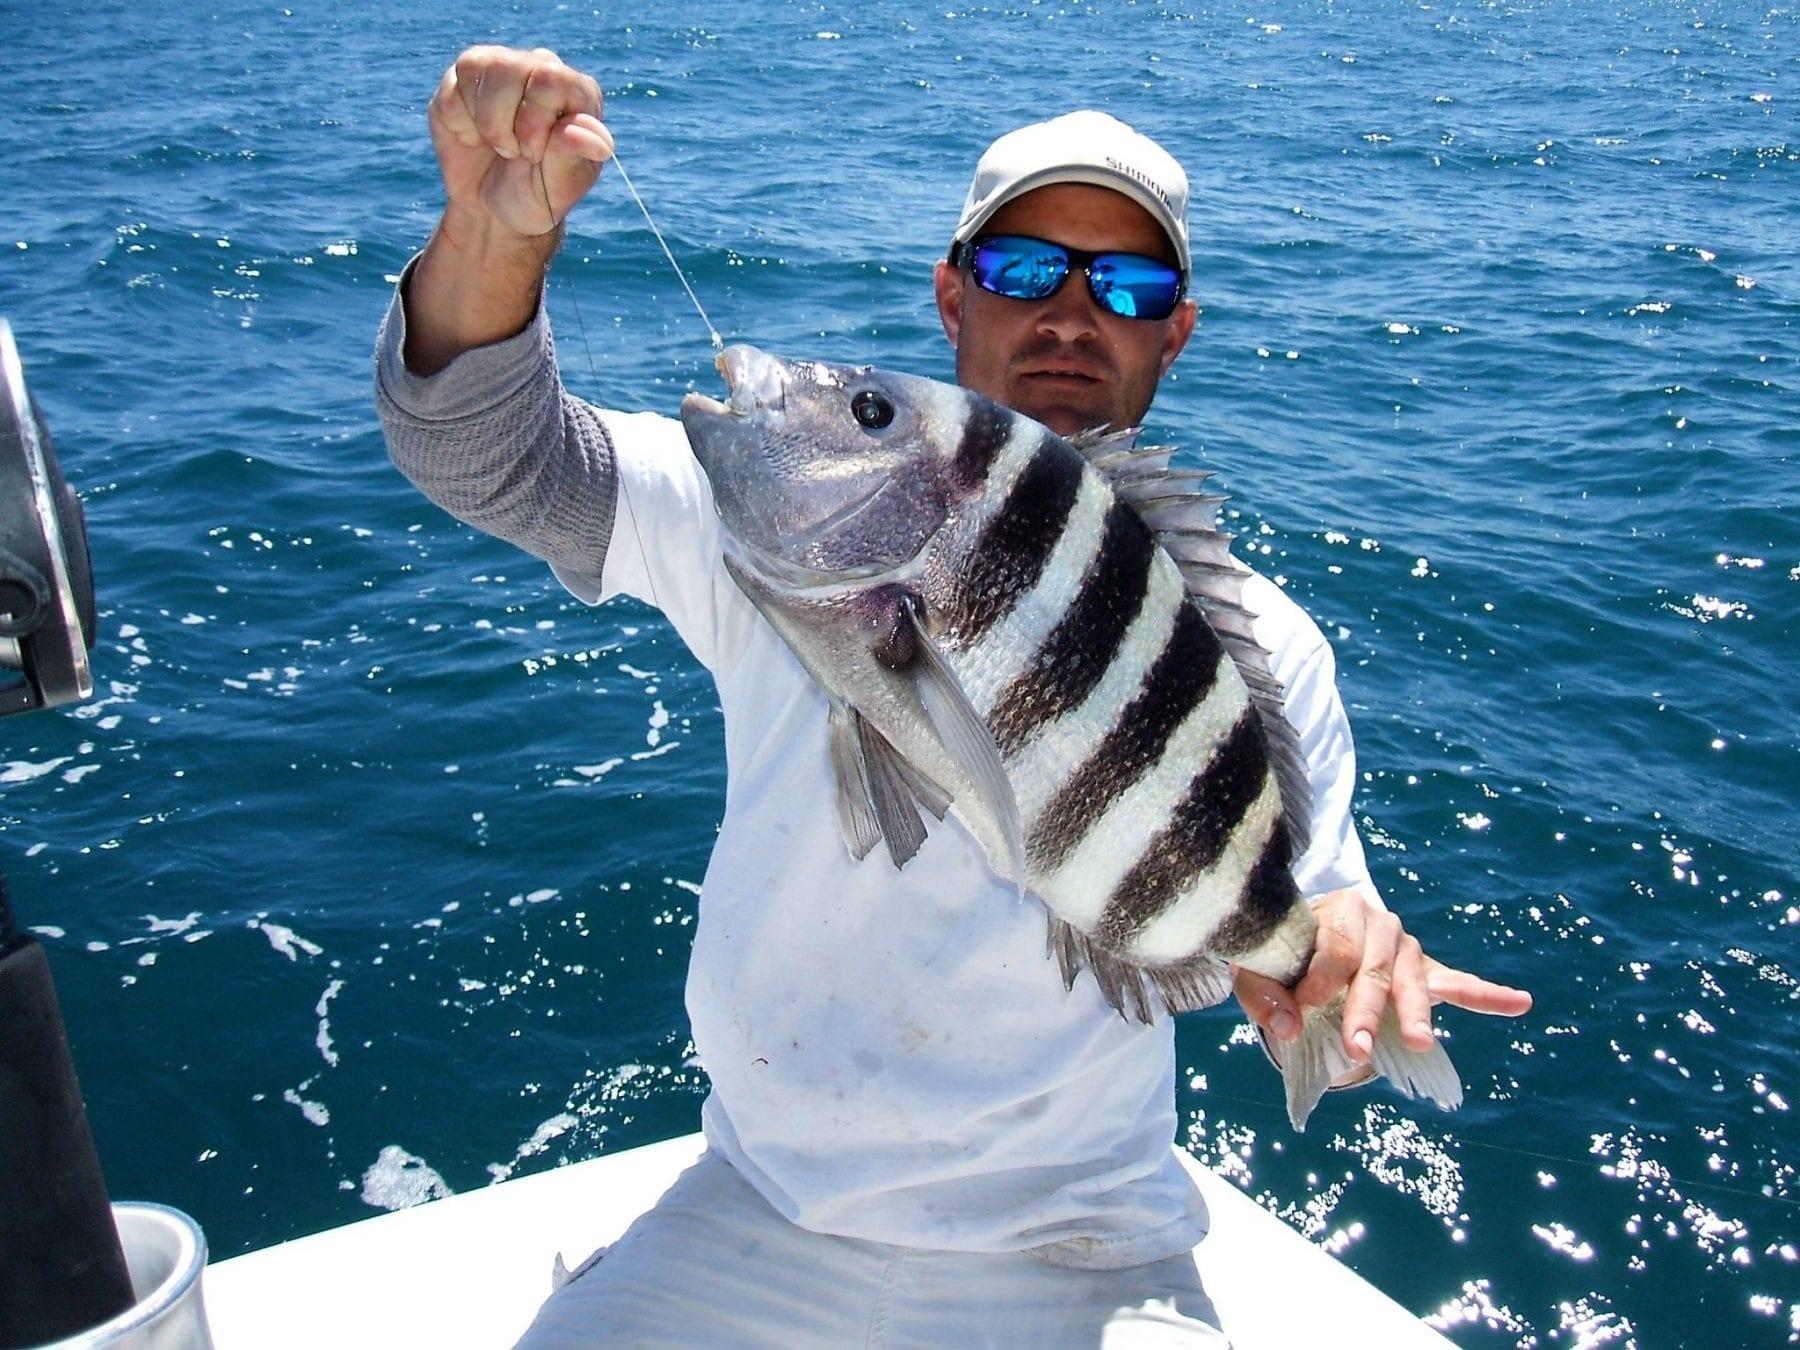 Sheepshead feeding frenzy coastal angler the angler for Northeast saltwater fishing reports